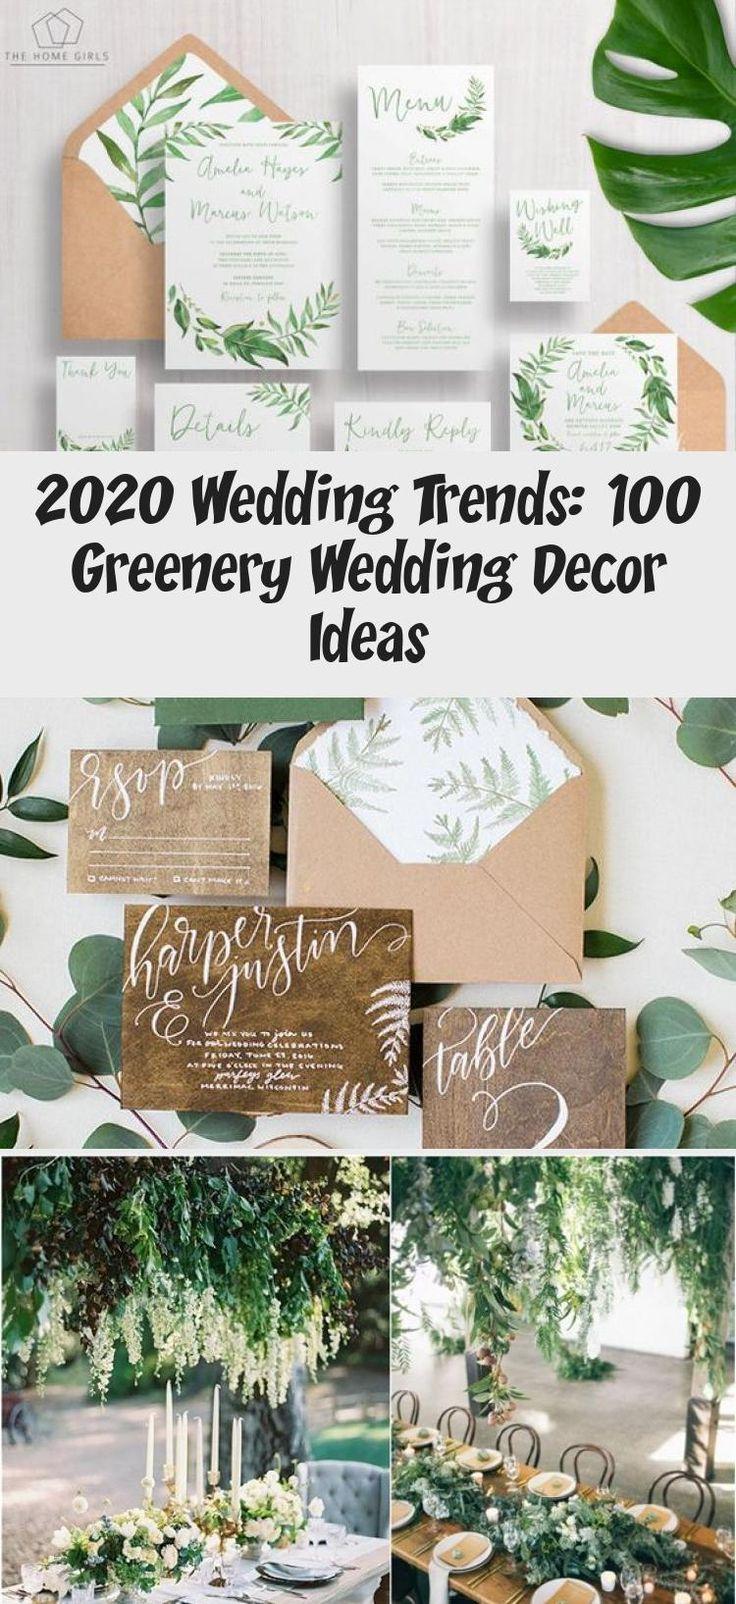 Jan 21, 2020 - Greenery eucalyptus rustic wedding arch decor ideas #green #wedding #weddingideas #dpf #deerpearlflowers #rusticwedding